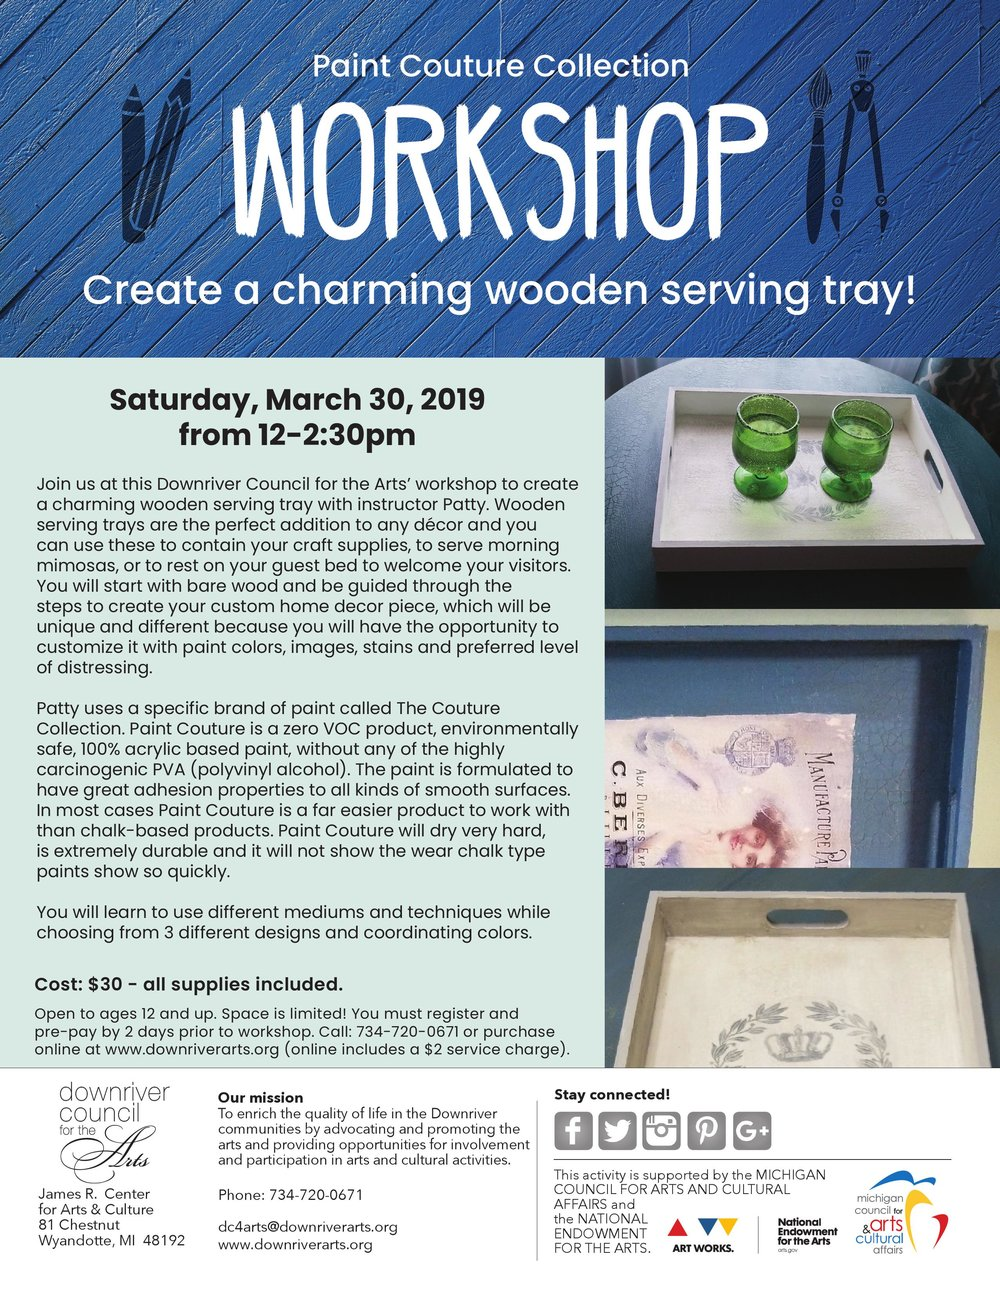 Patty-woodtray-Workshop 0323-85x11_00001.jpg